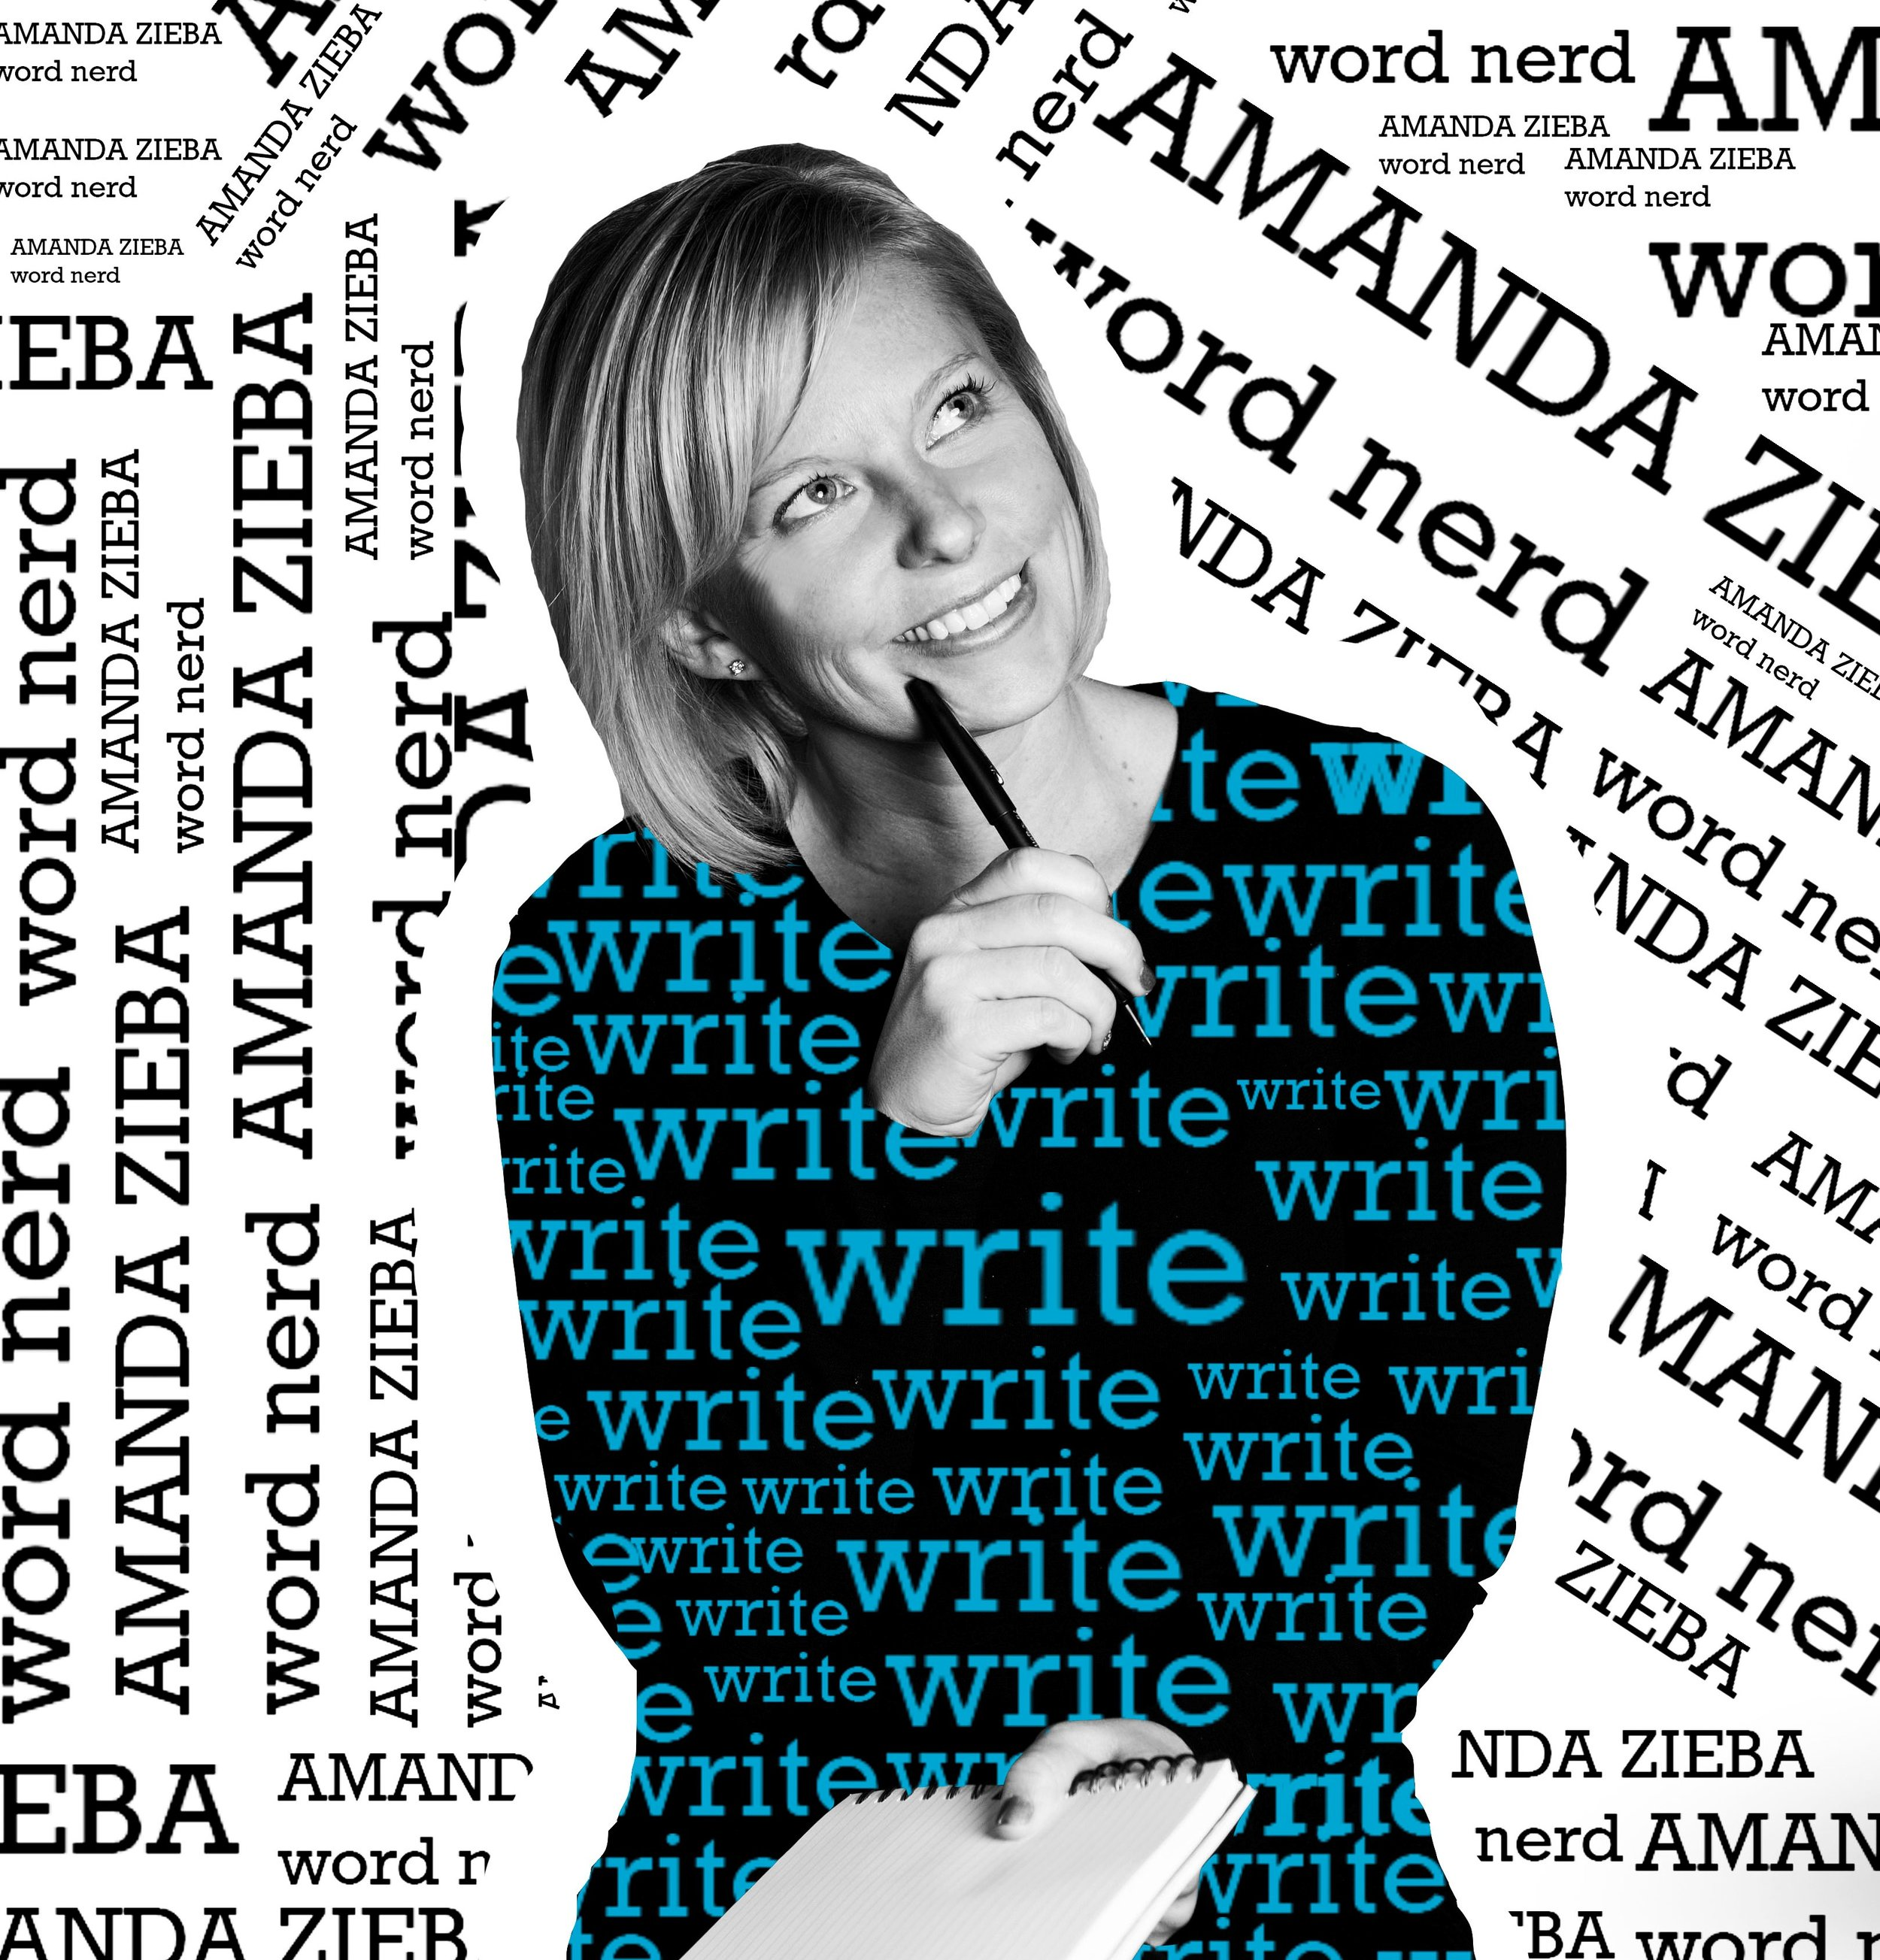 amanda_write (2).jpg